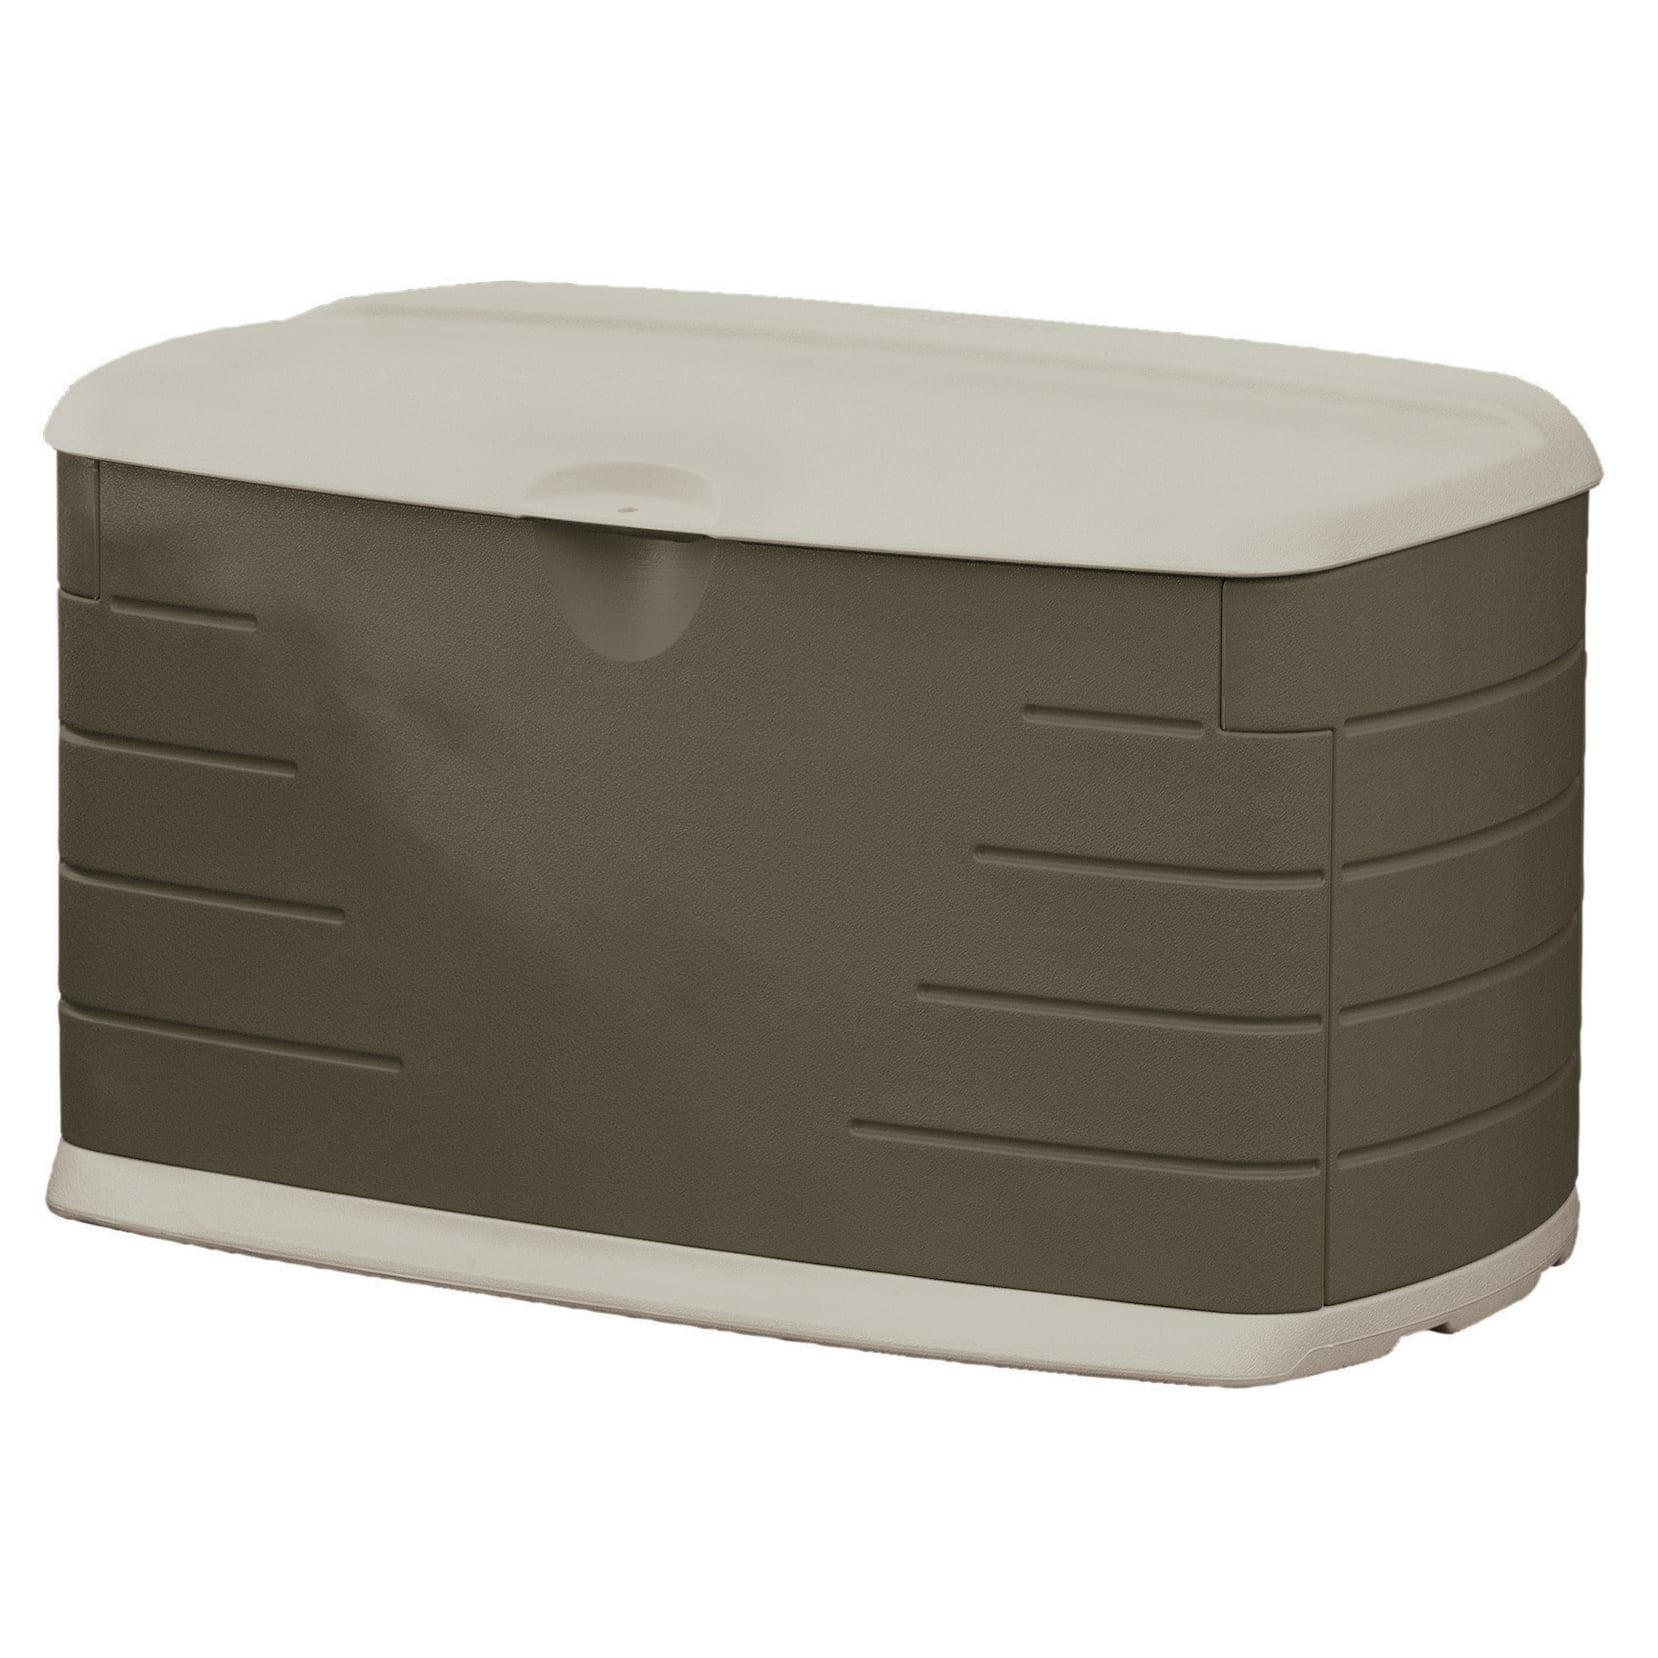 Rubbermaid 2047053 73 Gallon Medium Resin Deck Box with Seat